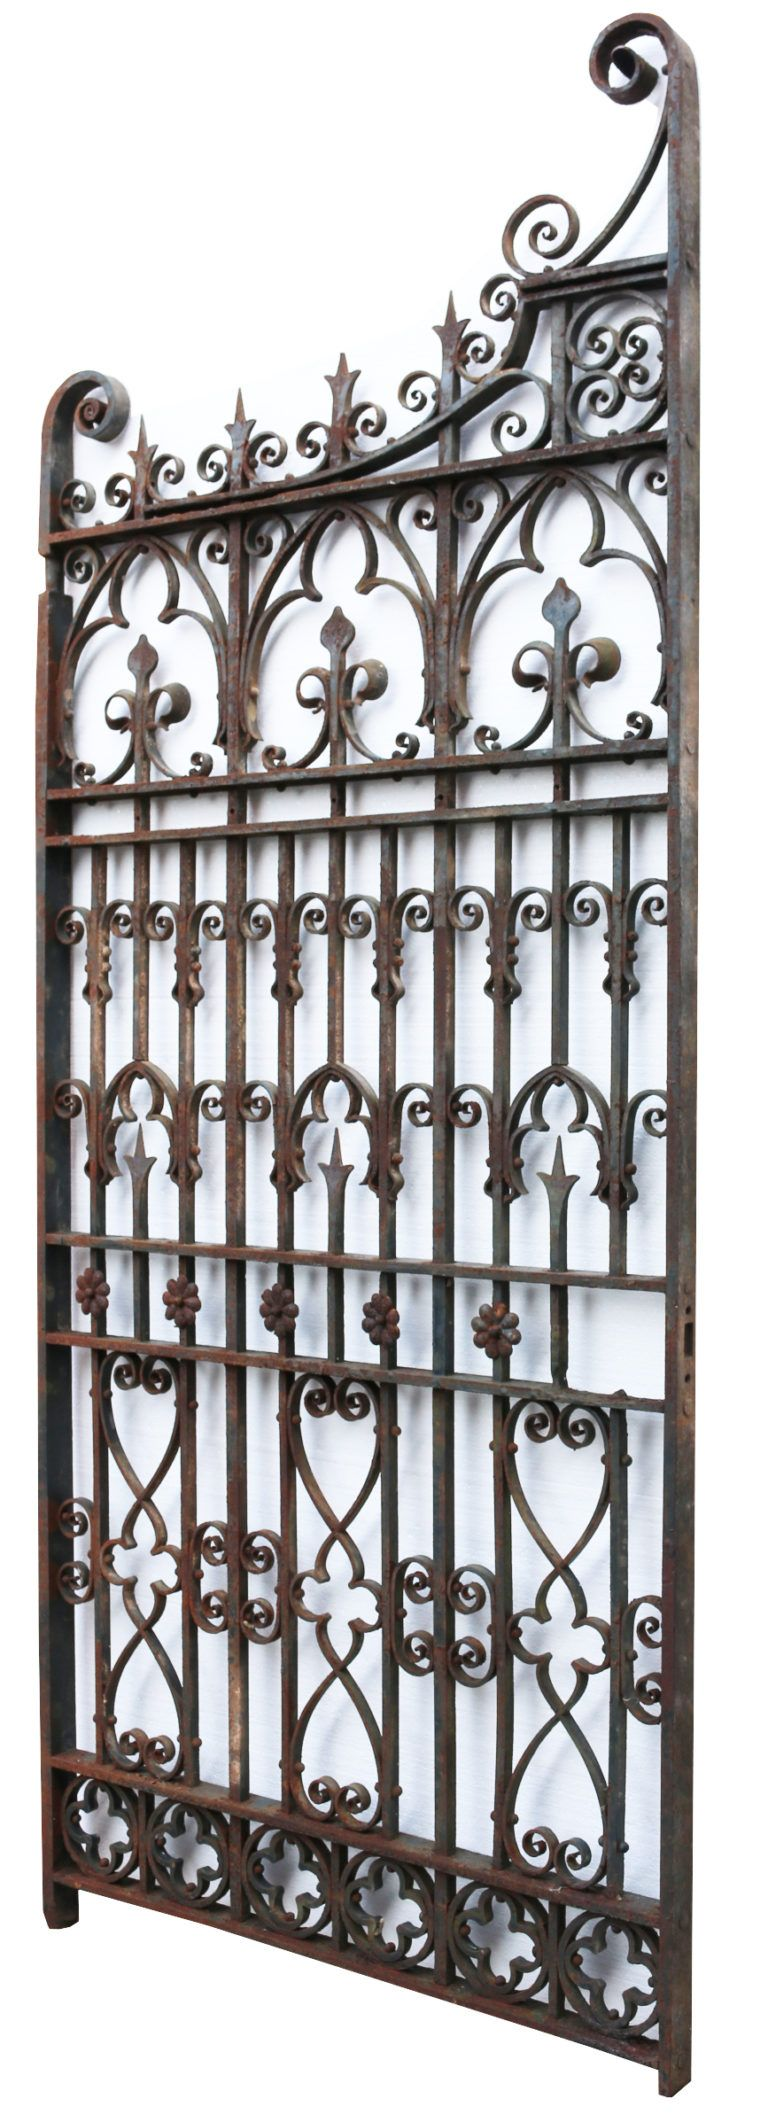 Antique English Wrought Iron Garden Gate Uk Heritage Iron Garden Gates Wrought Iron Garden Gates Wrought Iron